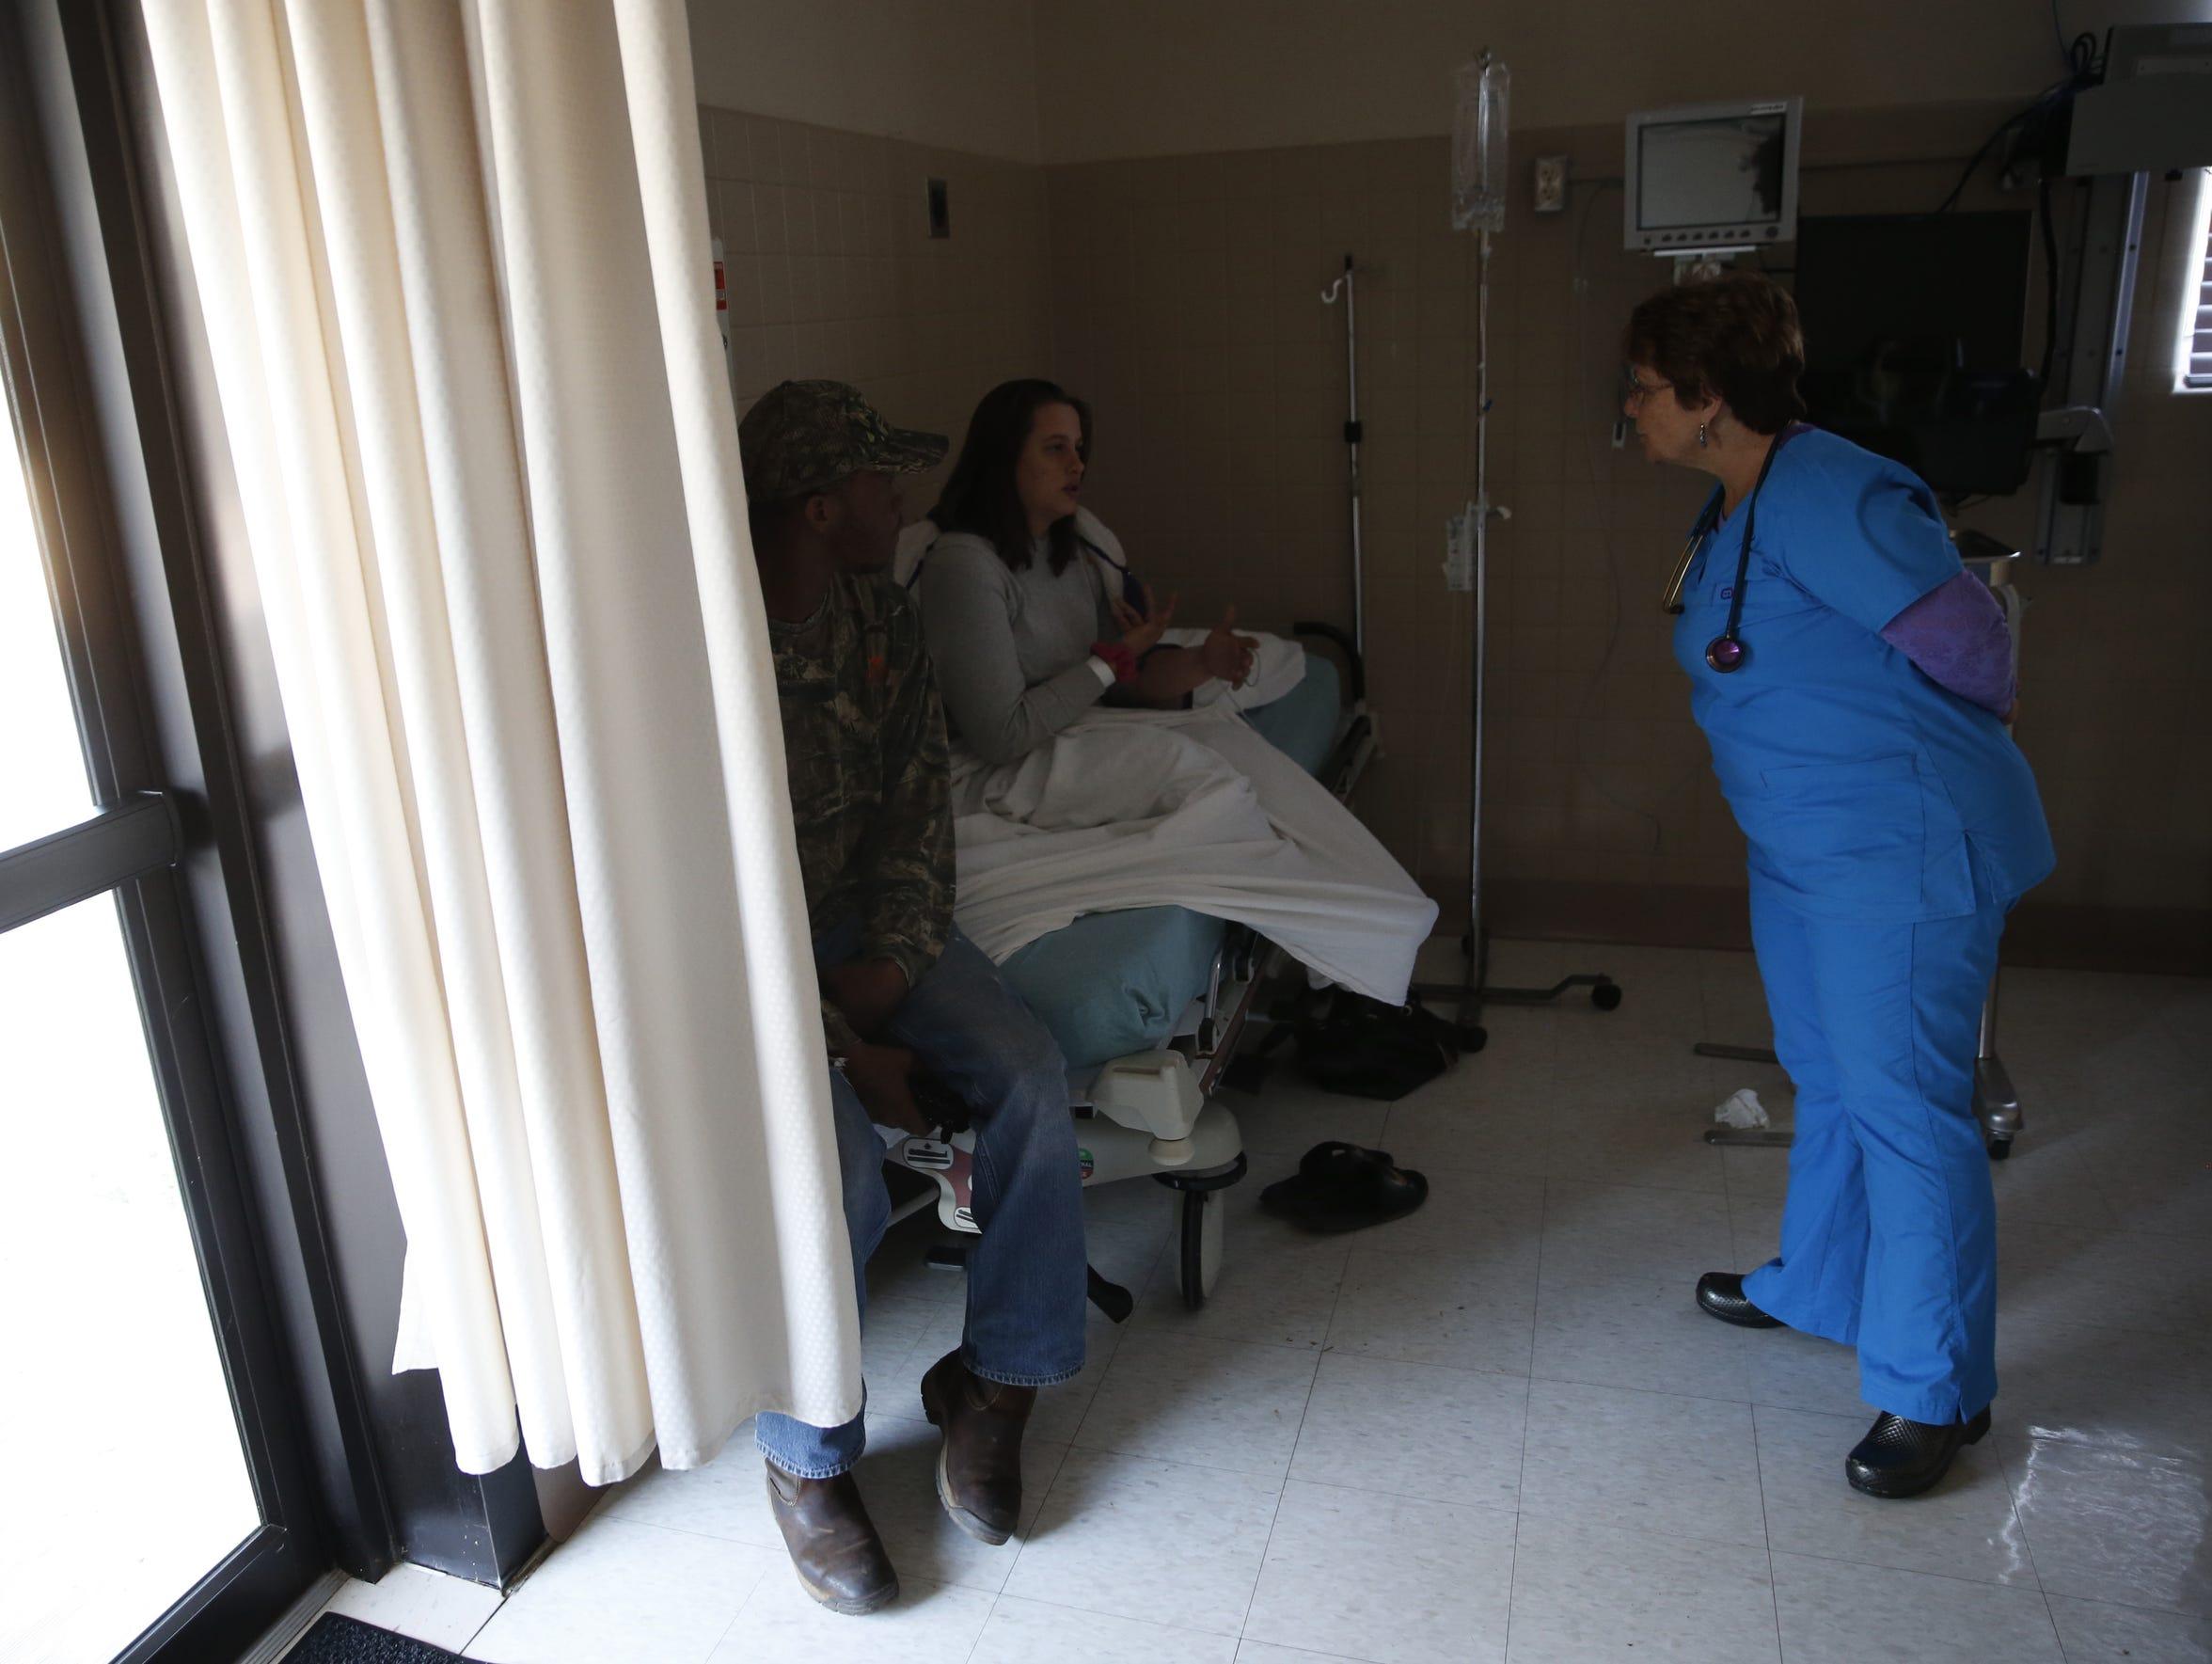 Nurse Ester Stoltzfus speaks to a patient in the dimly